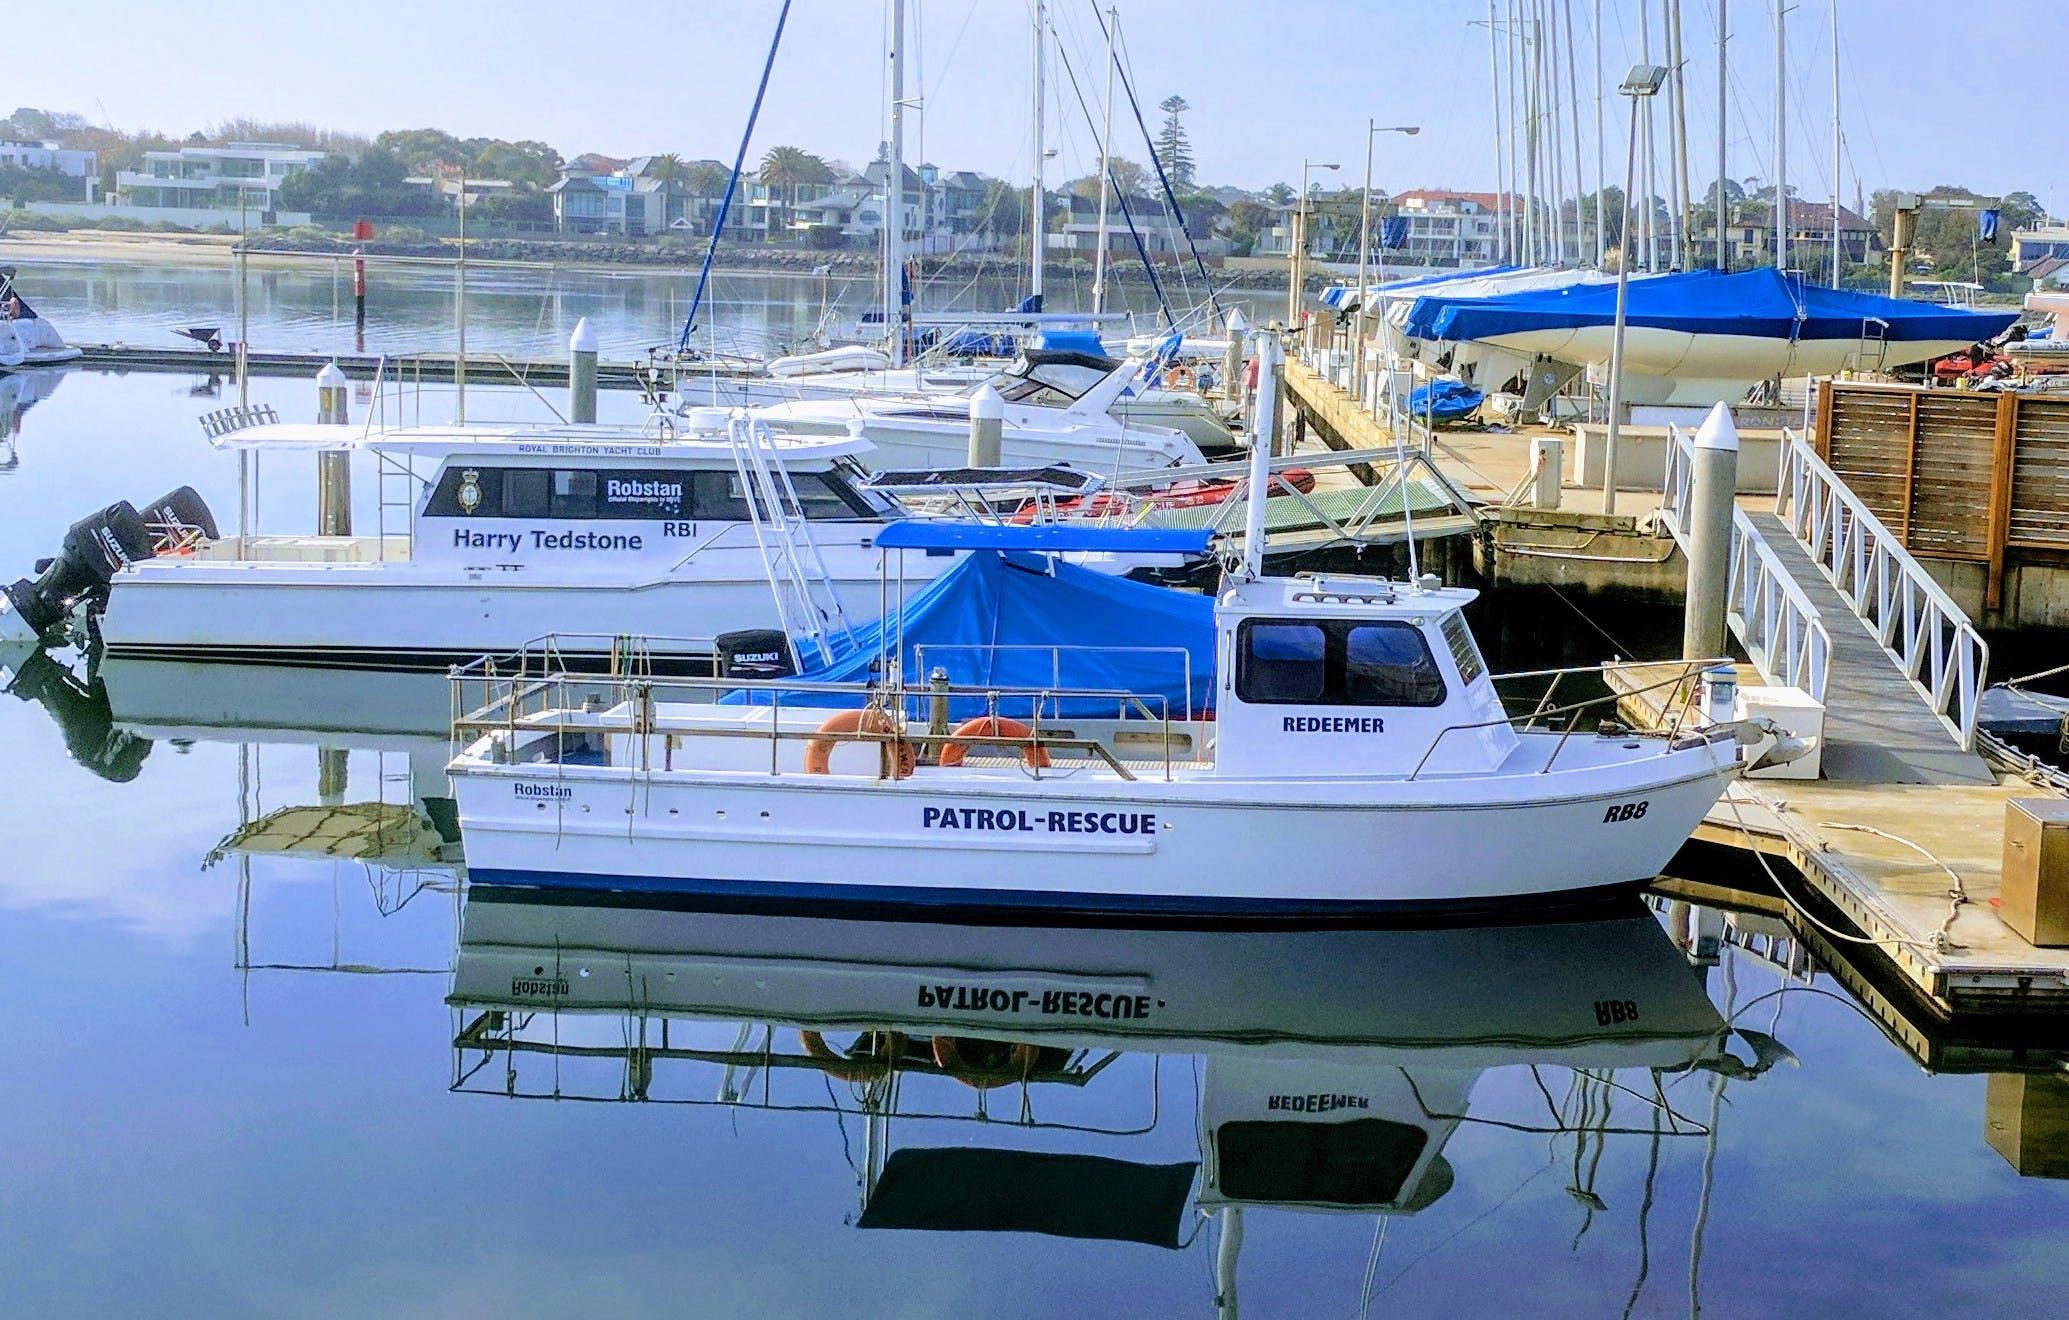 White Patrol-rescue Boat Near Brown Wooden Sea Dock